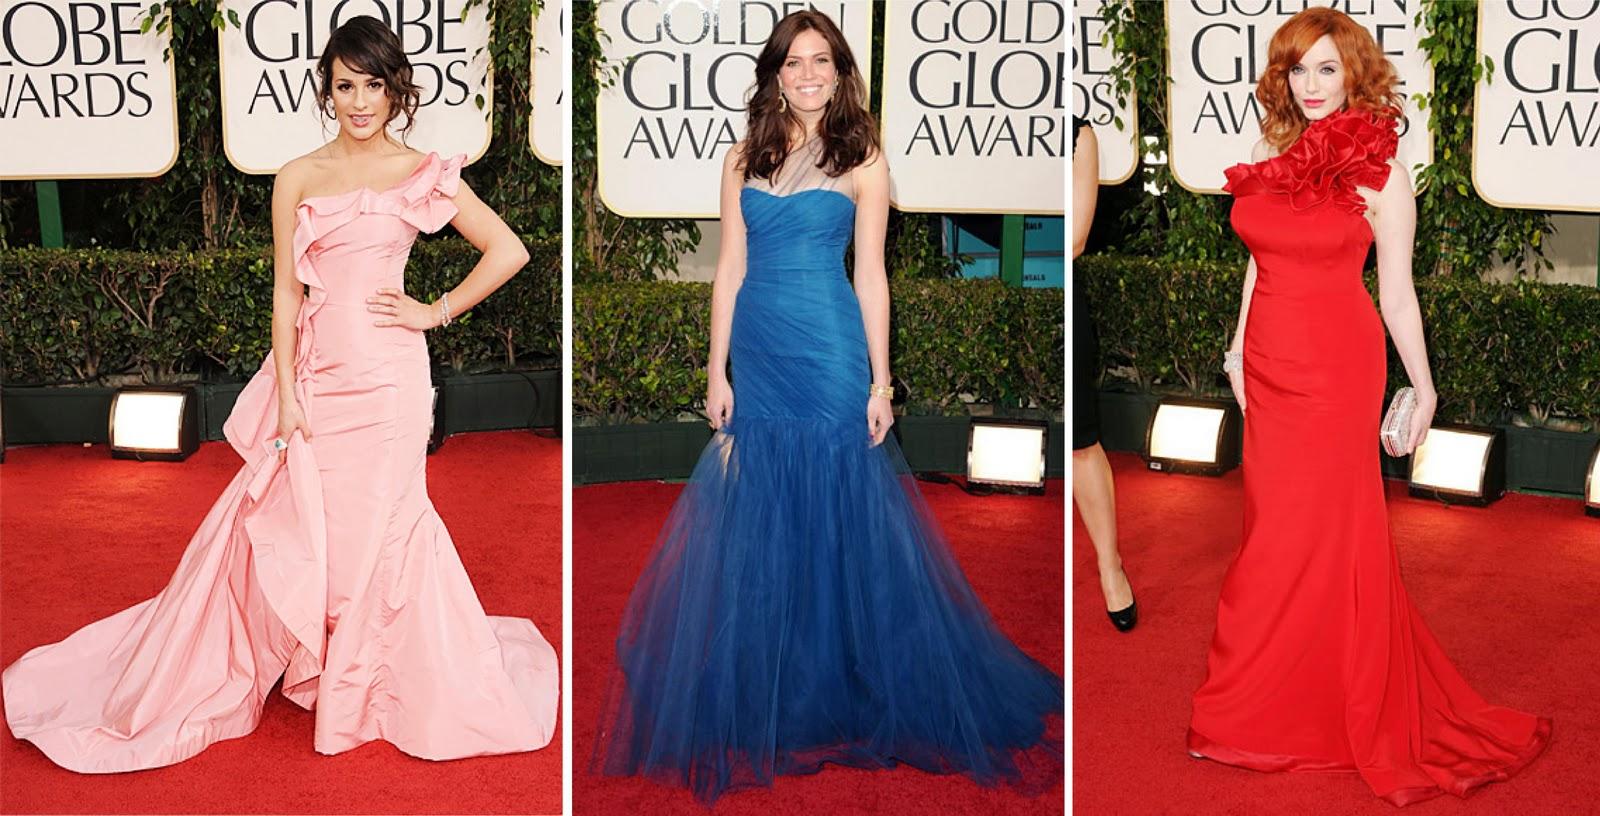 http://1.bp.blogspot.com/_zLsgnOzKTUQ/TTVuaggUzTI/AAAAAAAAR1k/mi29Eldlbmk/s1600/Globos+de+oro+2011+vestidos+6.jpg